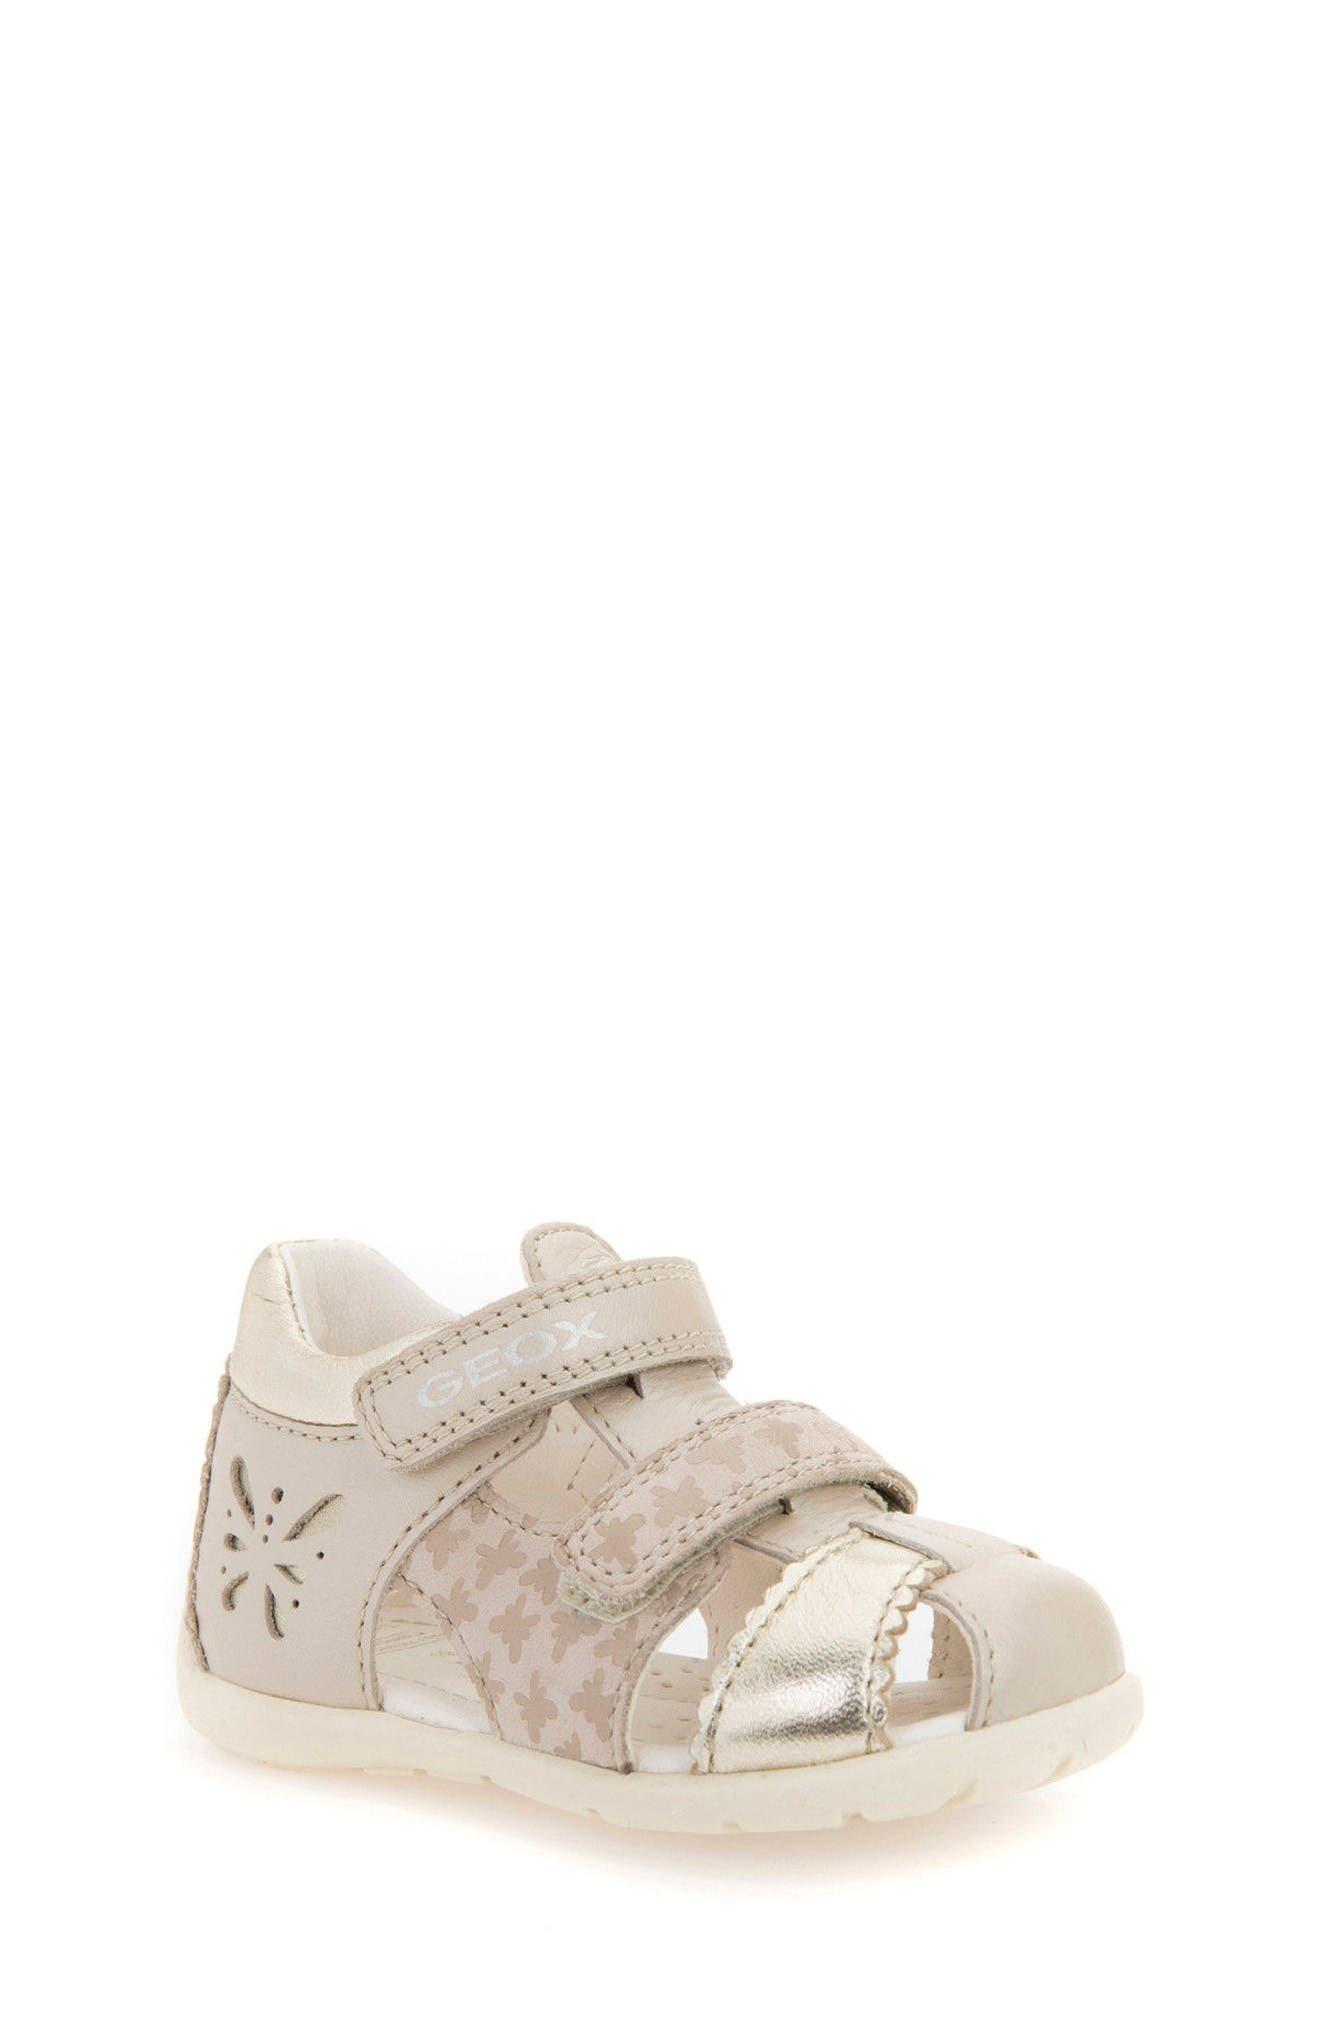 GEOX Kaytan 12 Sandal